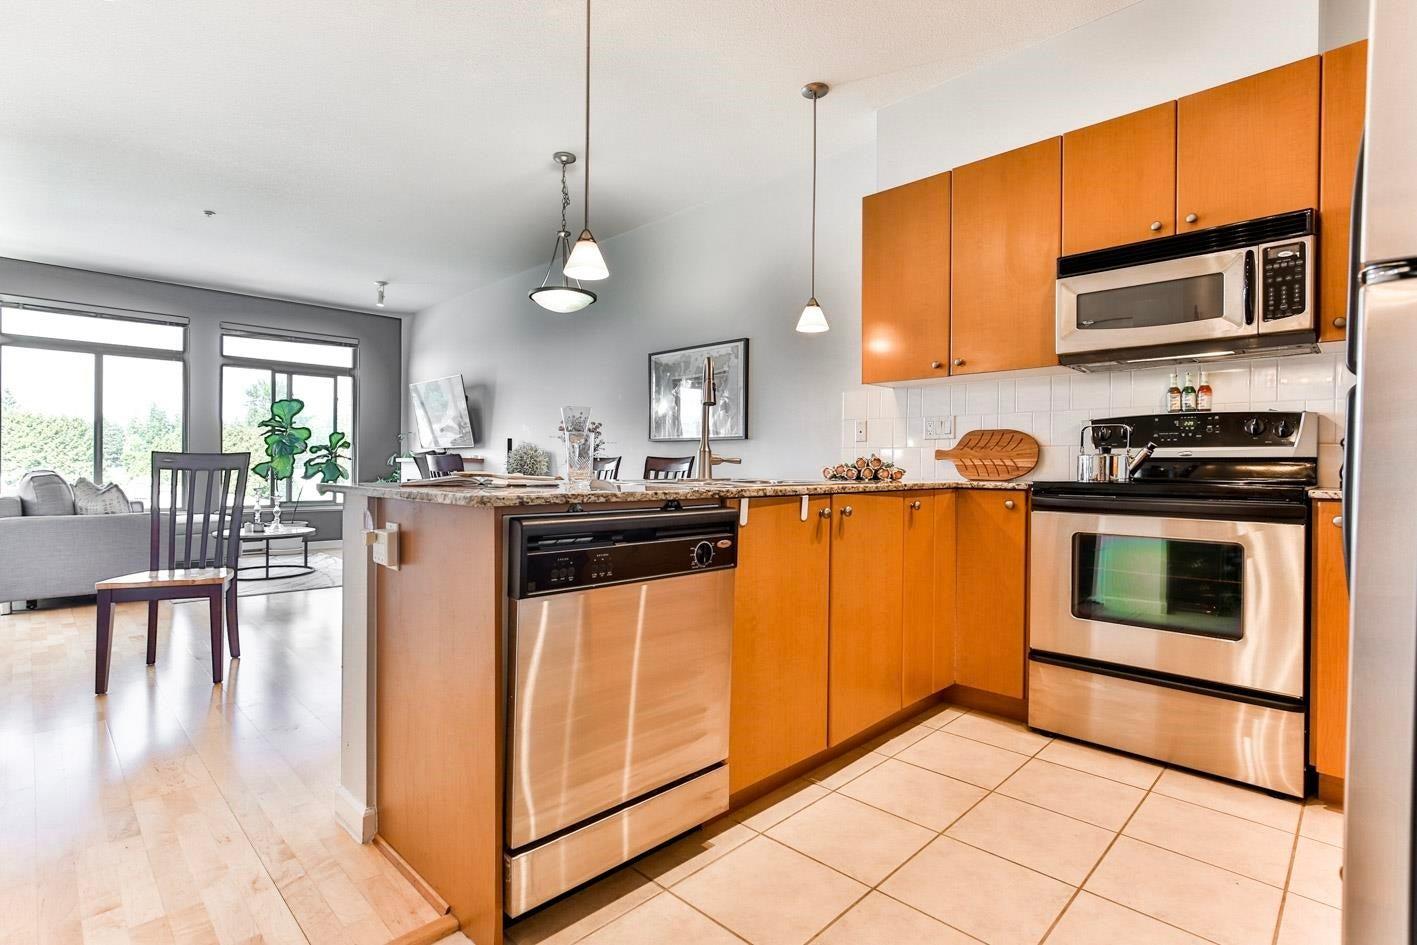 315 15380 102A AVENUE - Guildford Apartment/Condo for sale, 1 Bedroom (R2599892)